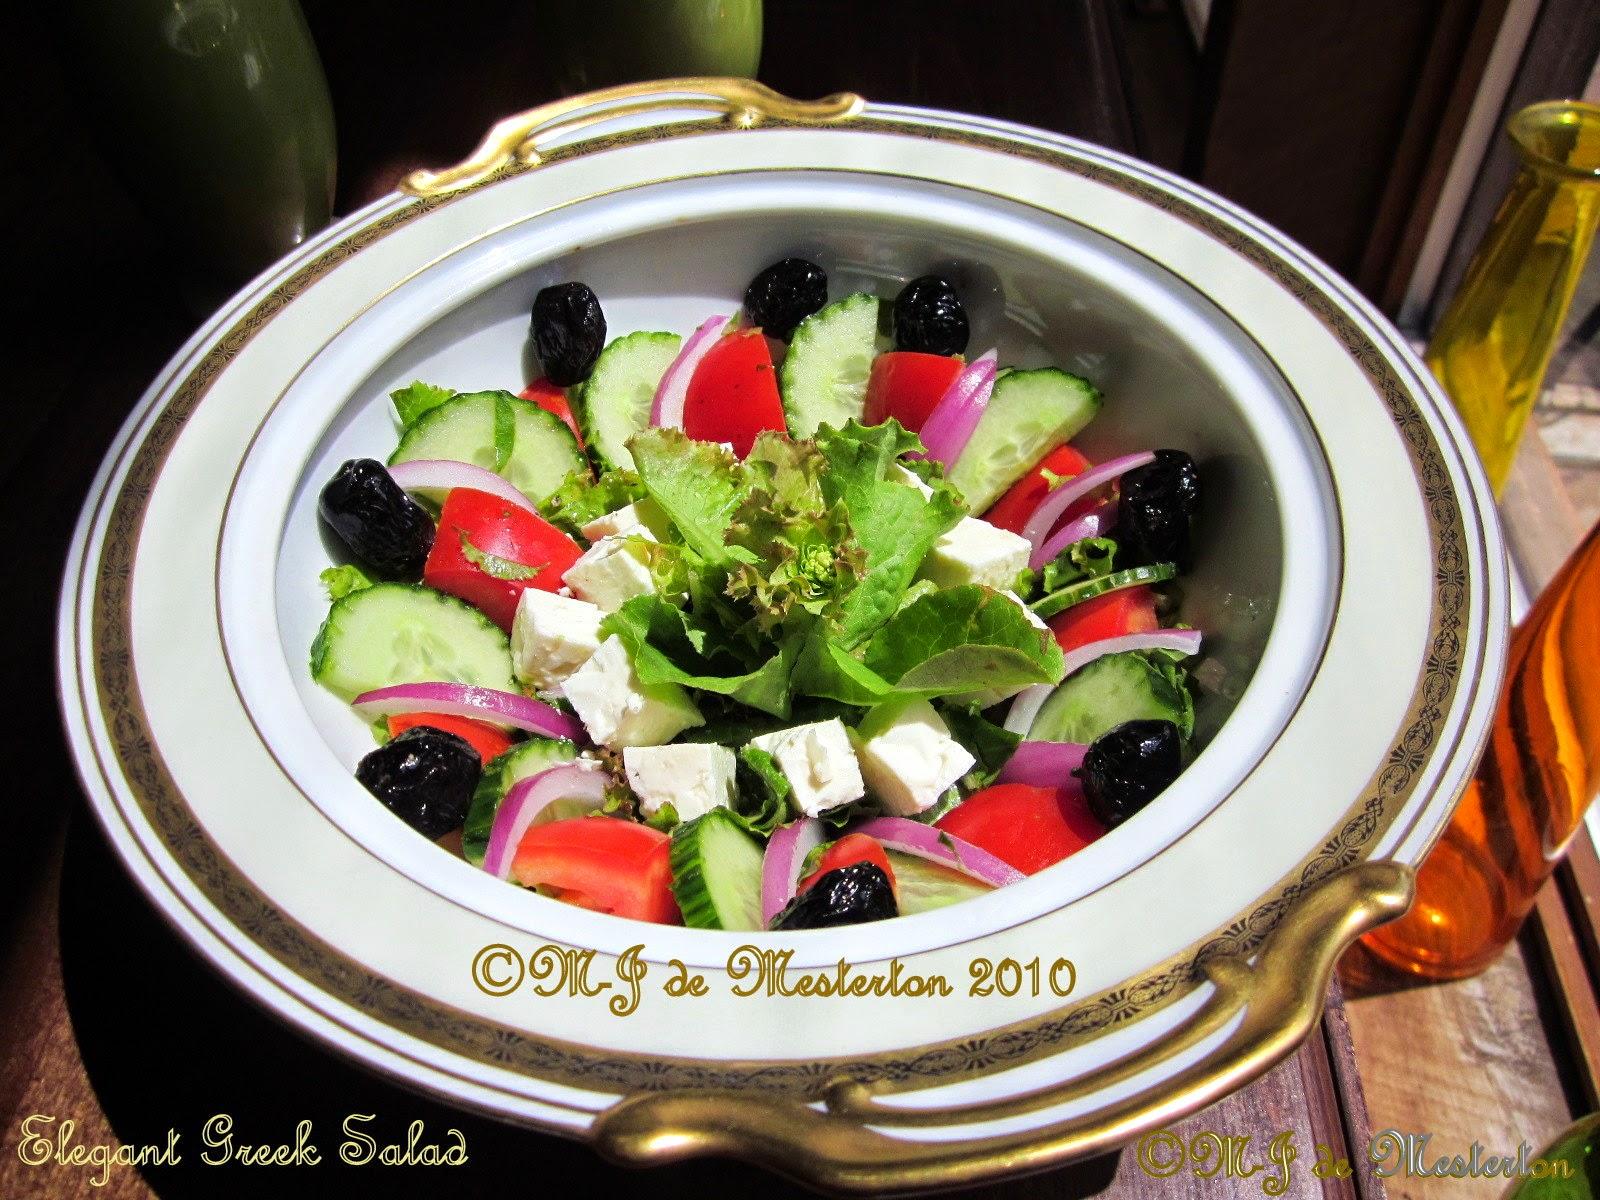 Visit the Elegant Cook, M-J de Mesterton